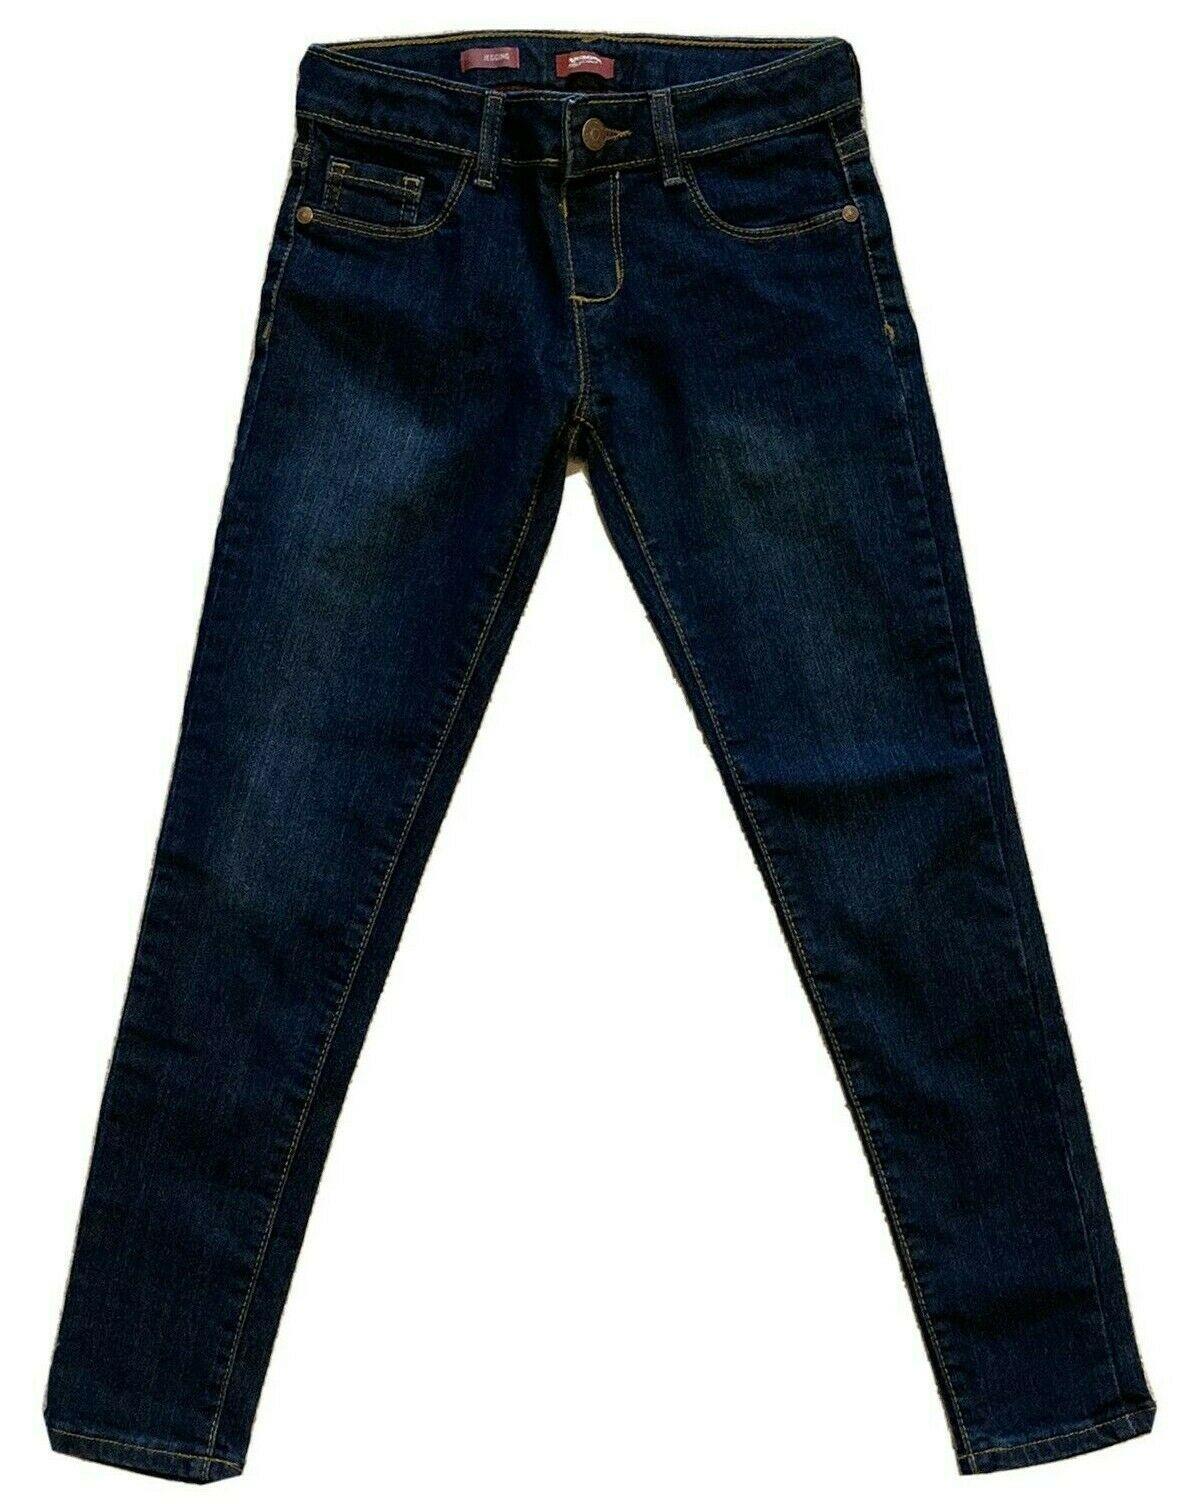 Arizona Jeans Co.Jeggings Dunkelblau Waschung Verstellbare Taille Mädchen - Eu 8 - $11.83